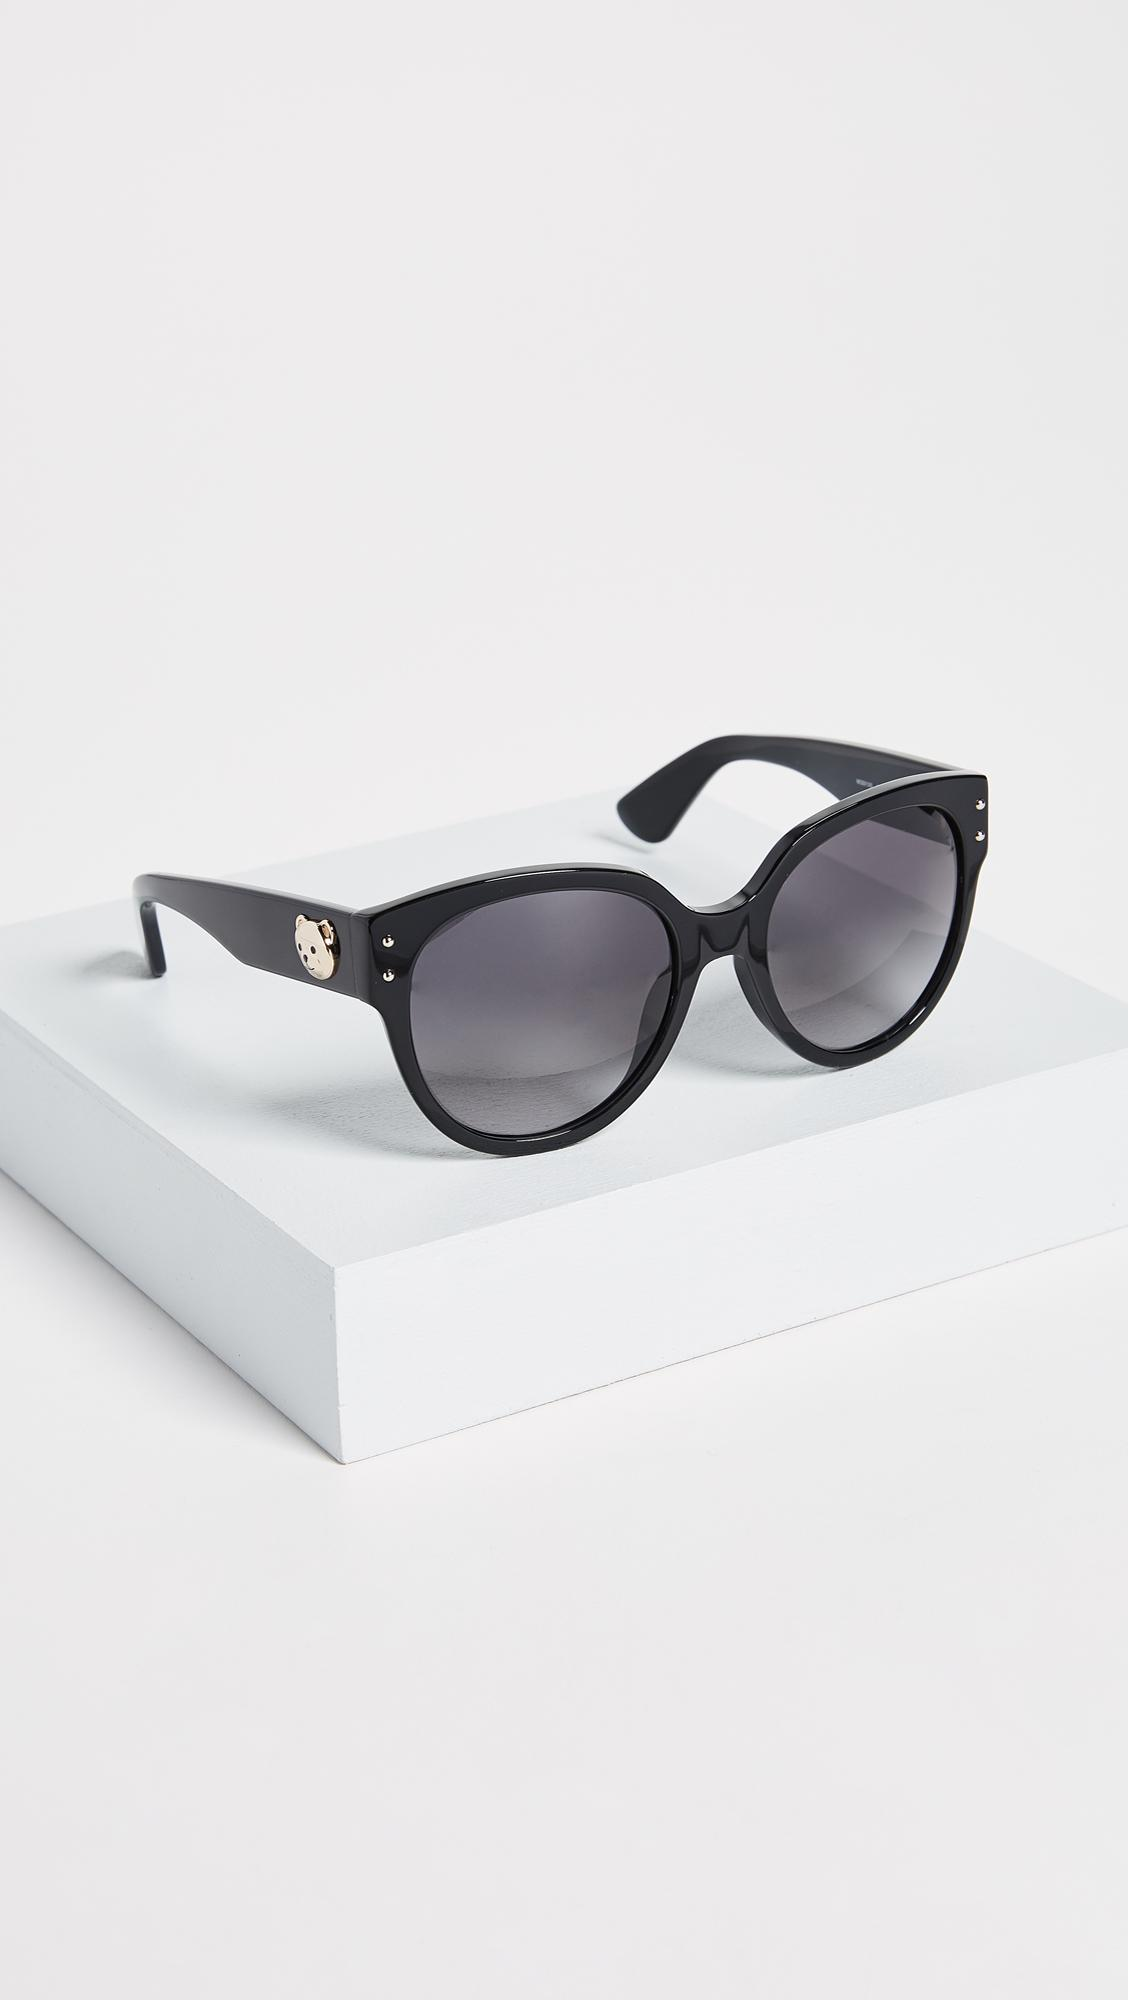 4da6c541ca8 Moschino Bear Logo Sunglasses in Gray - Lyst